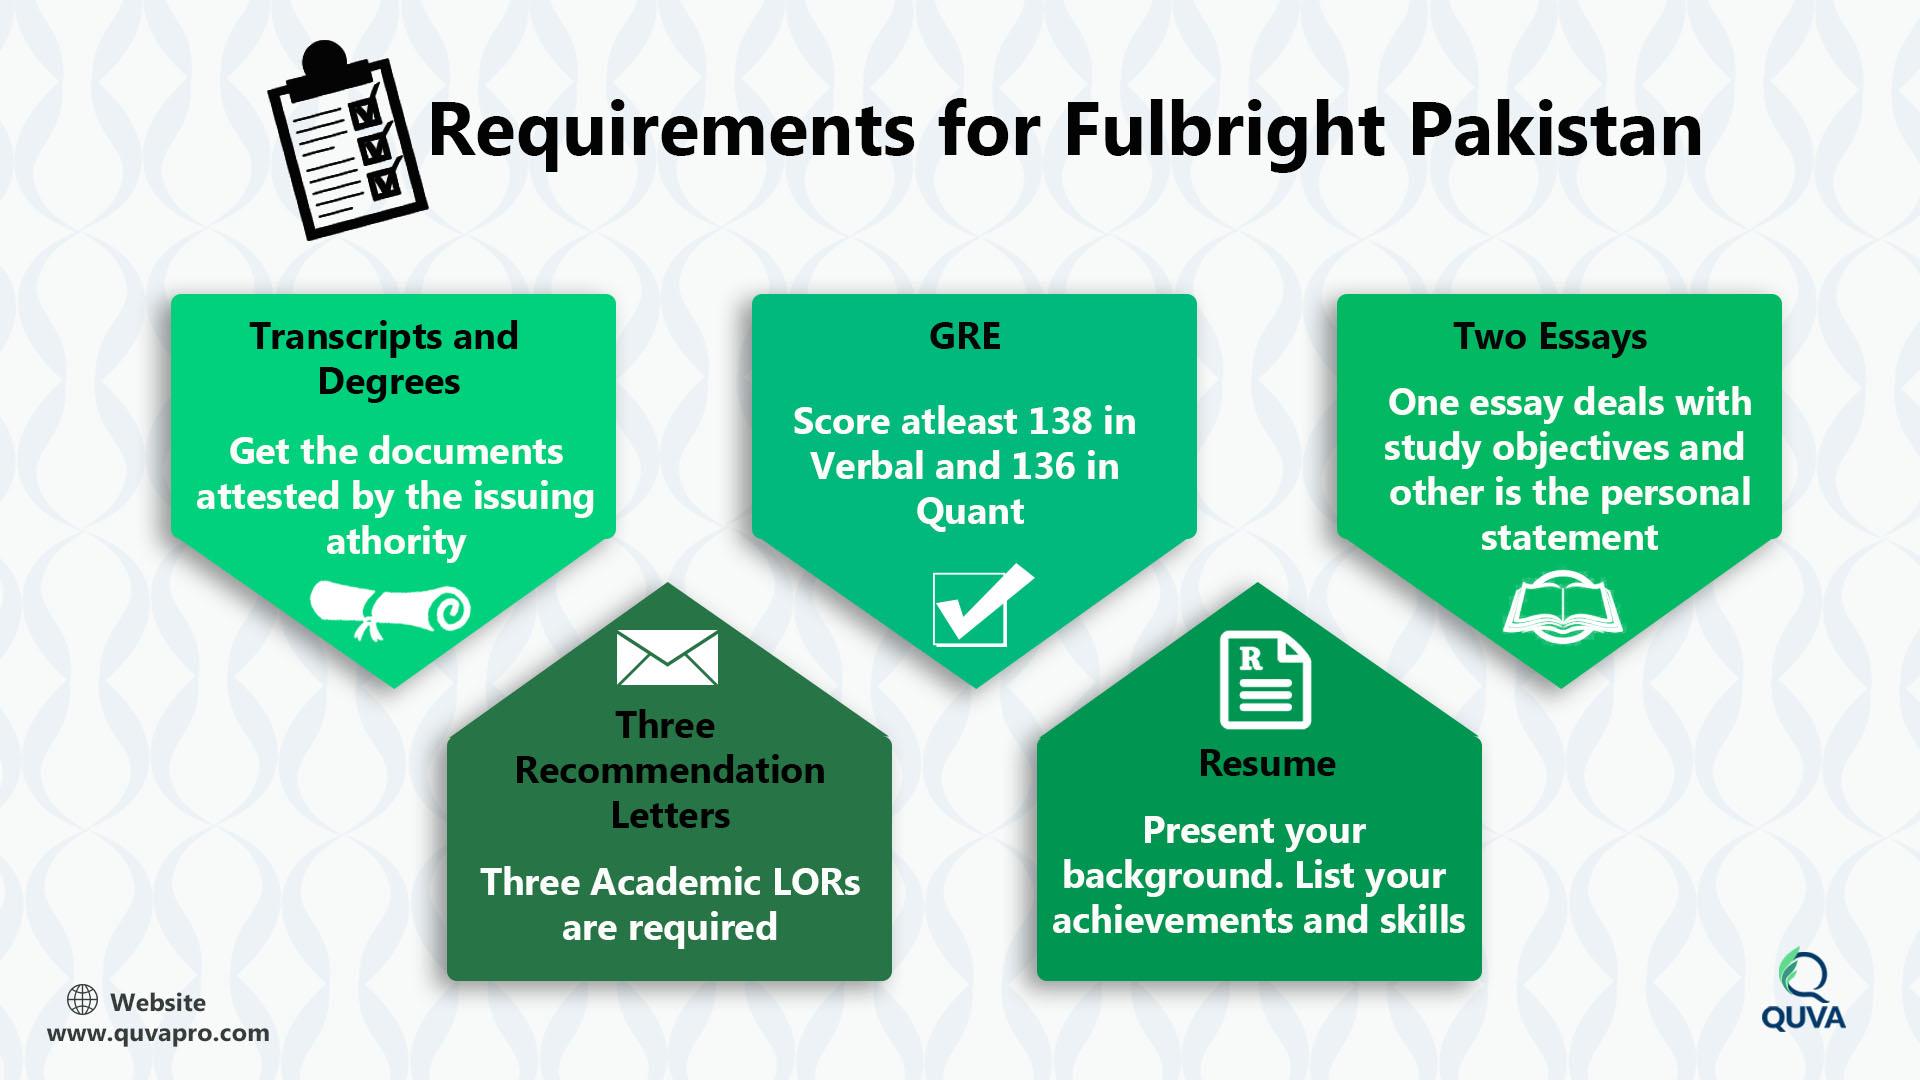 Fulbright Scholarship Pakistan in a nutshell- Quva